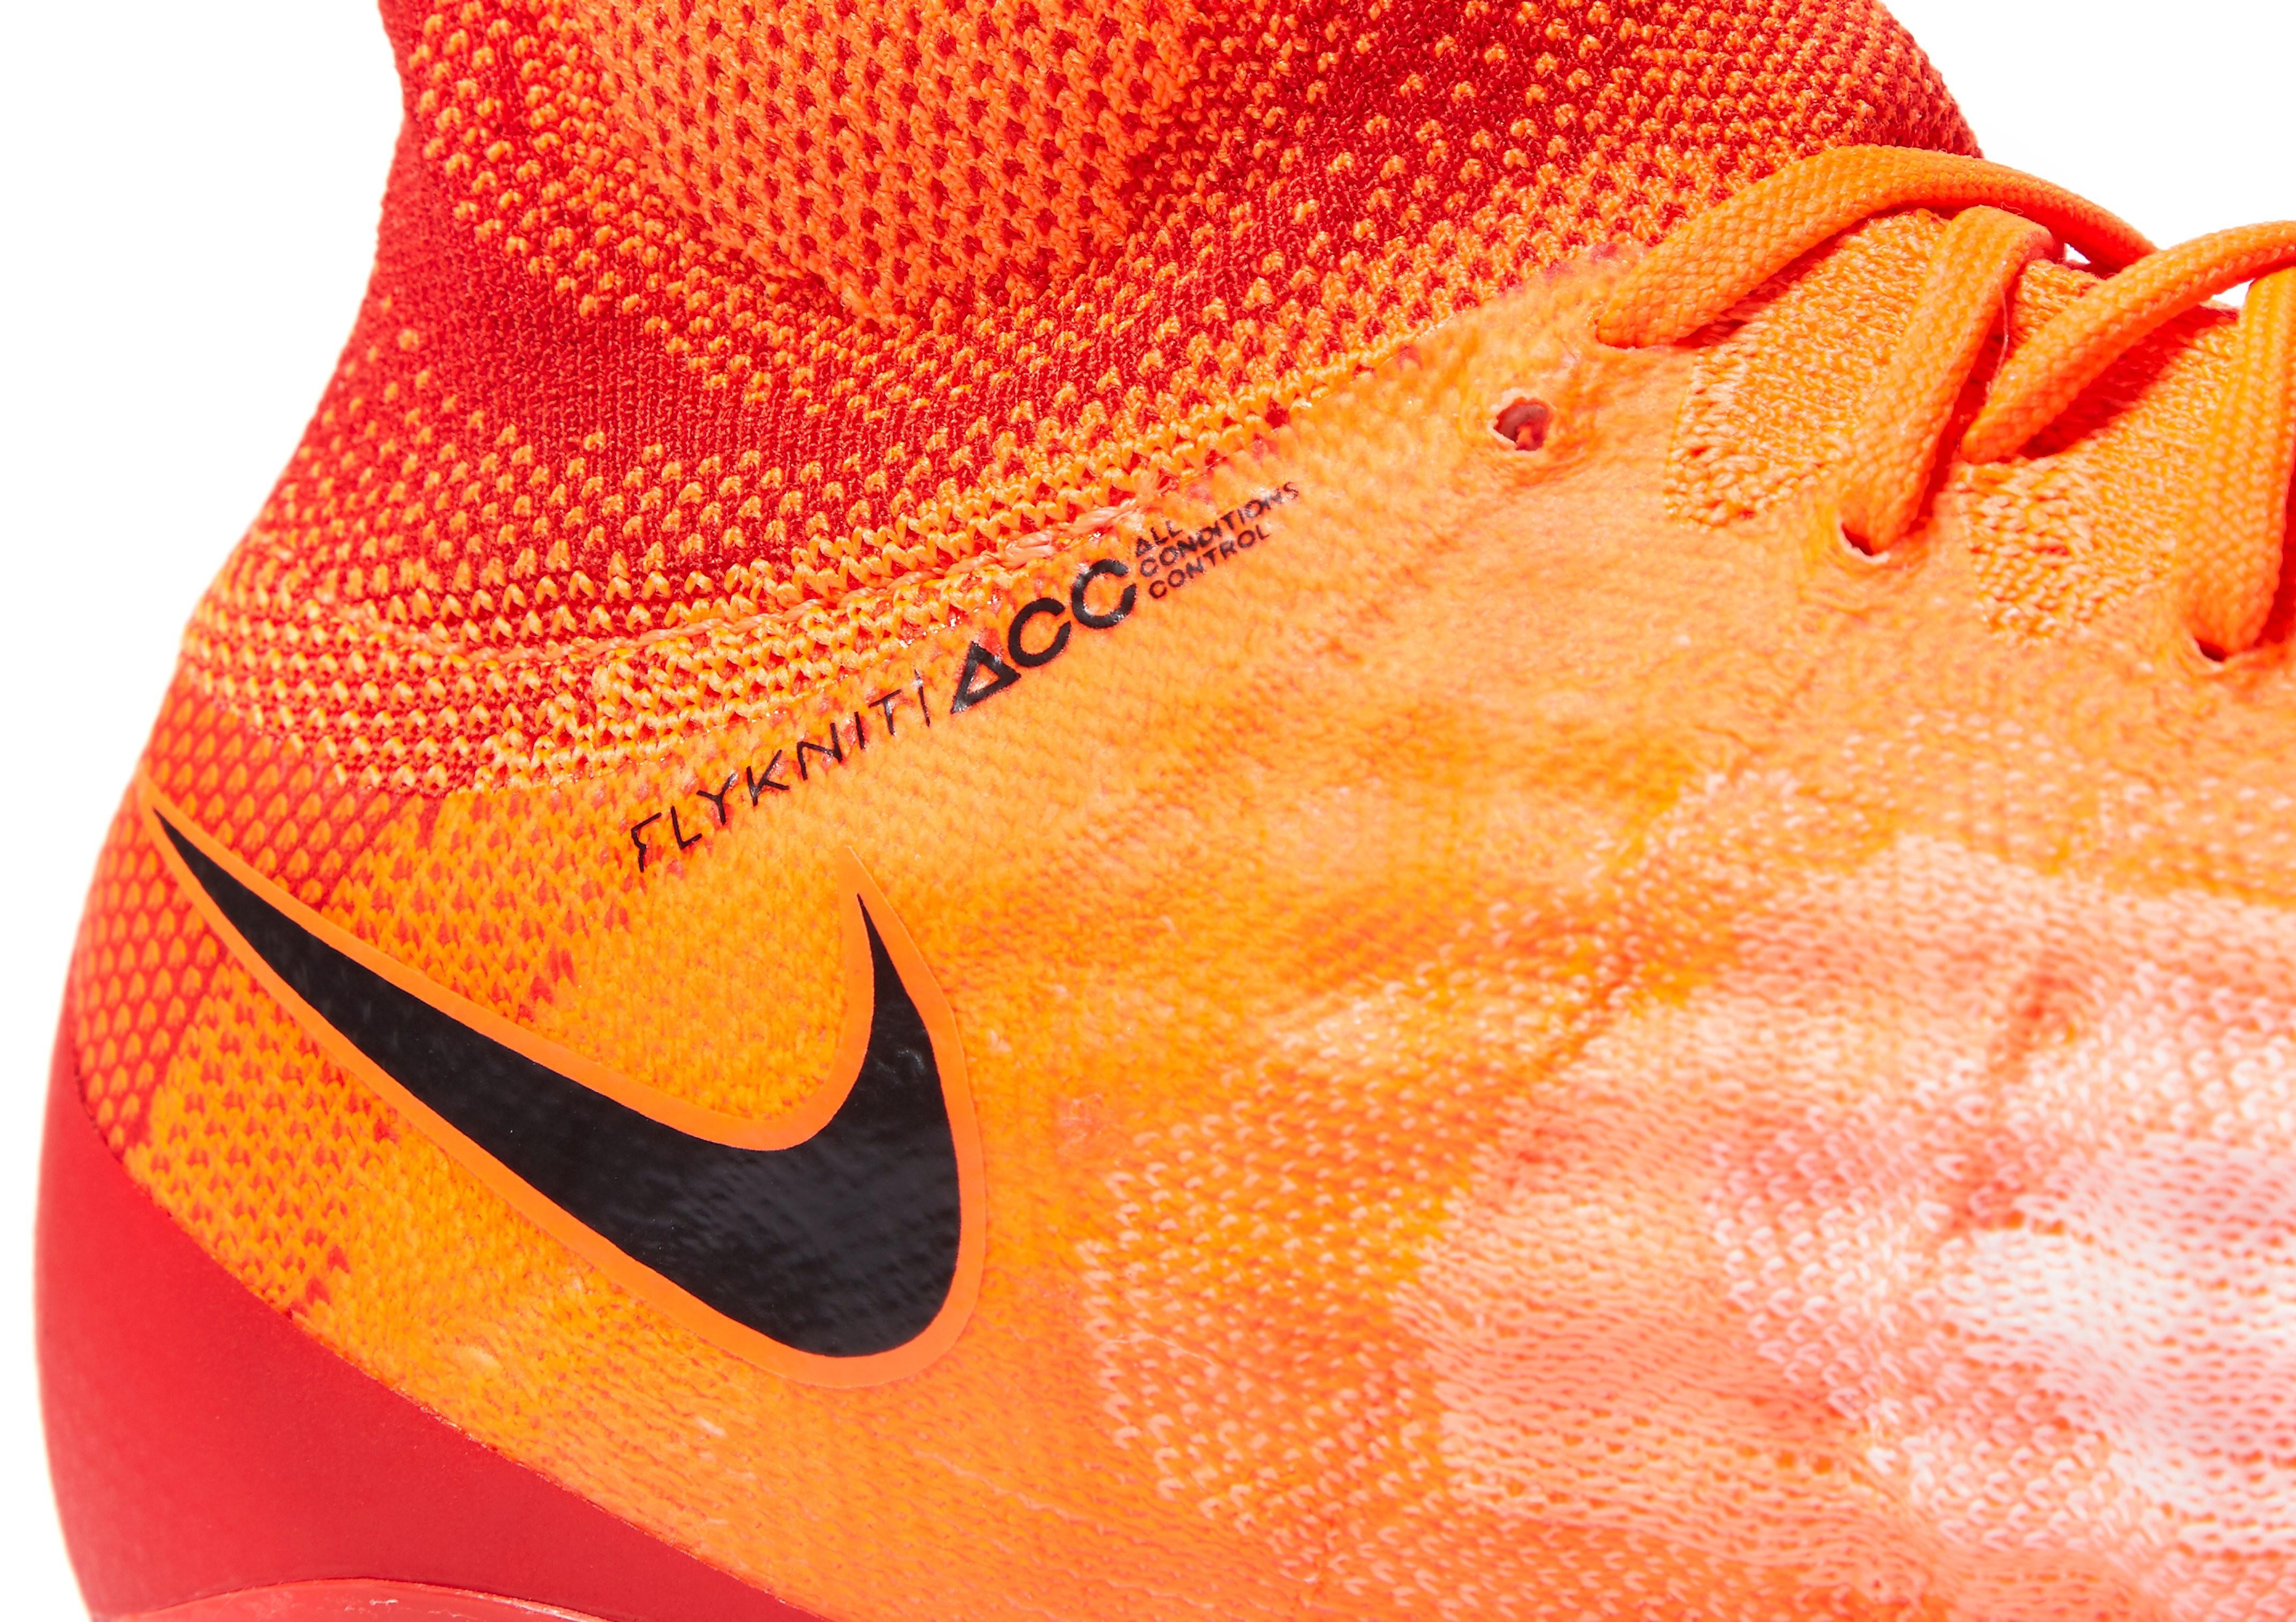 Nike Radiation Flare Magista Obra II FG